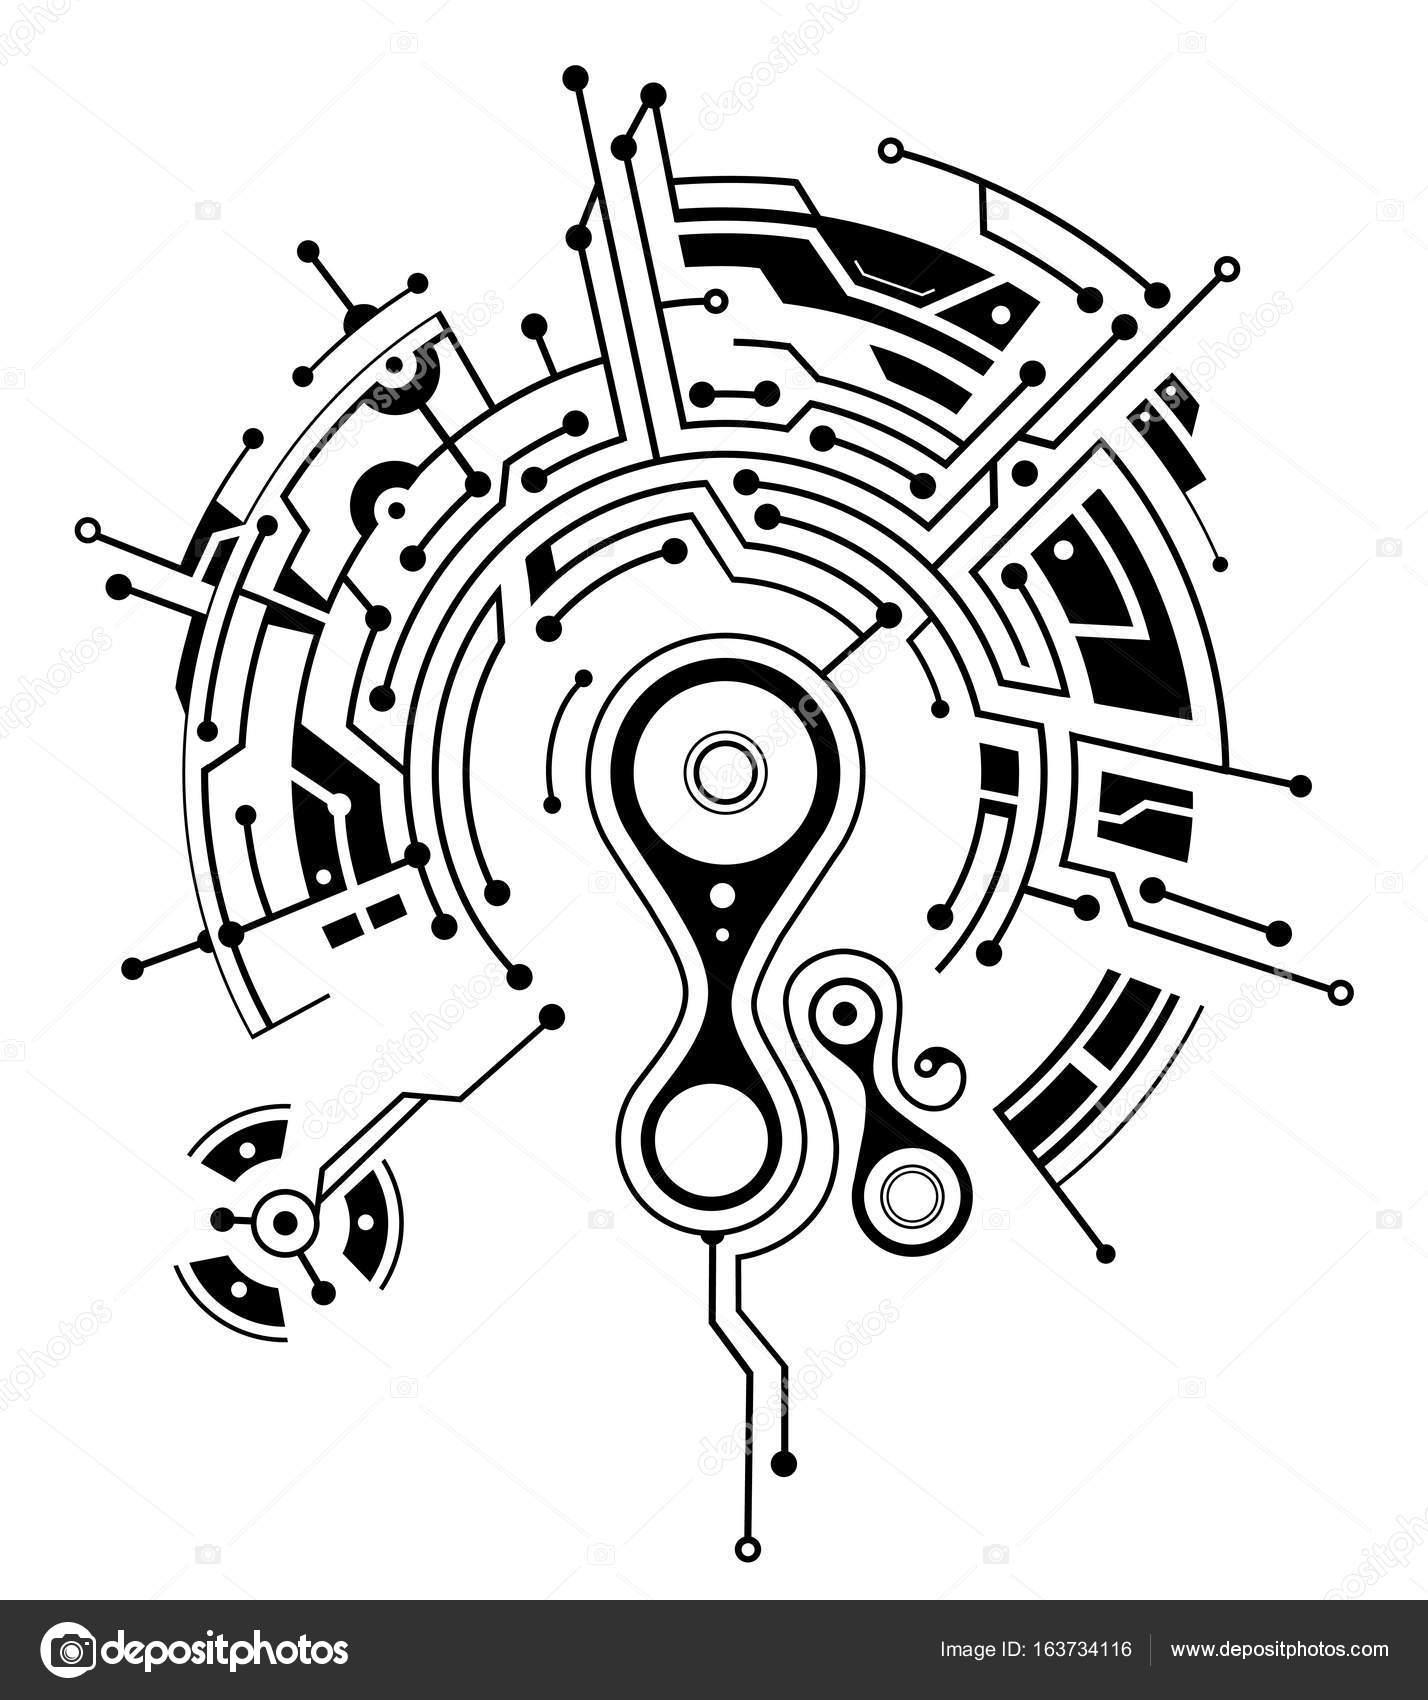 tatouage avec des  u00e9l u00e9ments de circuit imprim u00e9  u2014 image vectorielle akv lv  u00a9  163734116